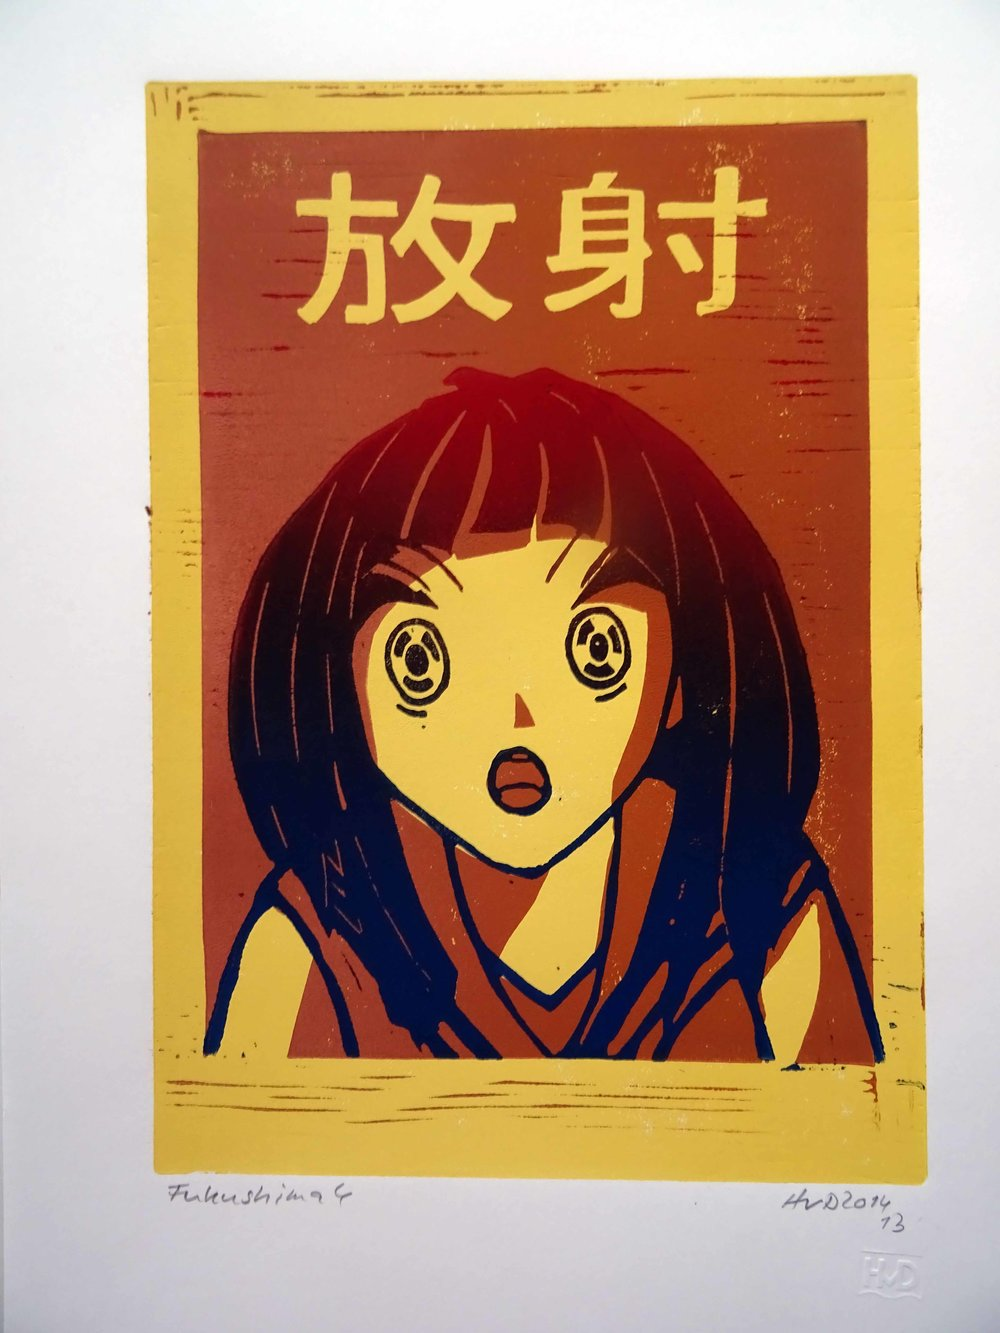 146 - Fukushima 4, radiation 3-plate lino 30x21 cm, 80 €